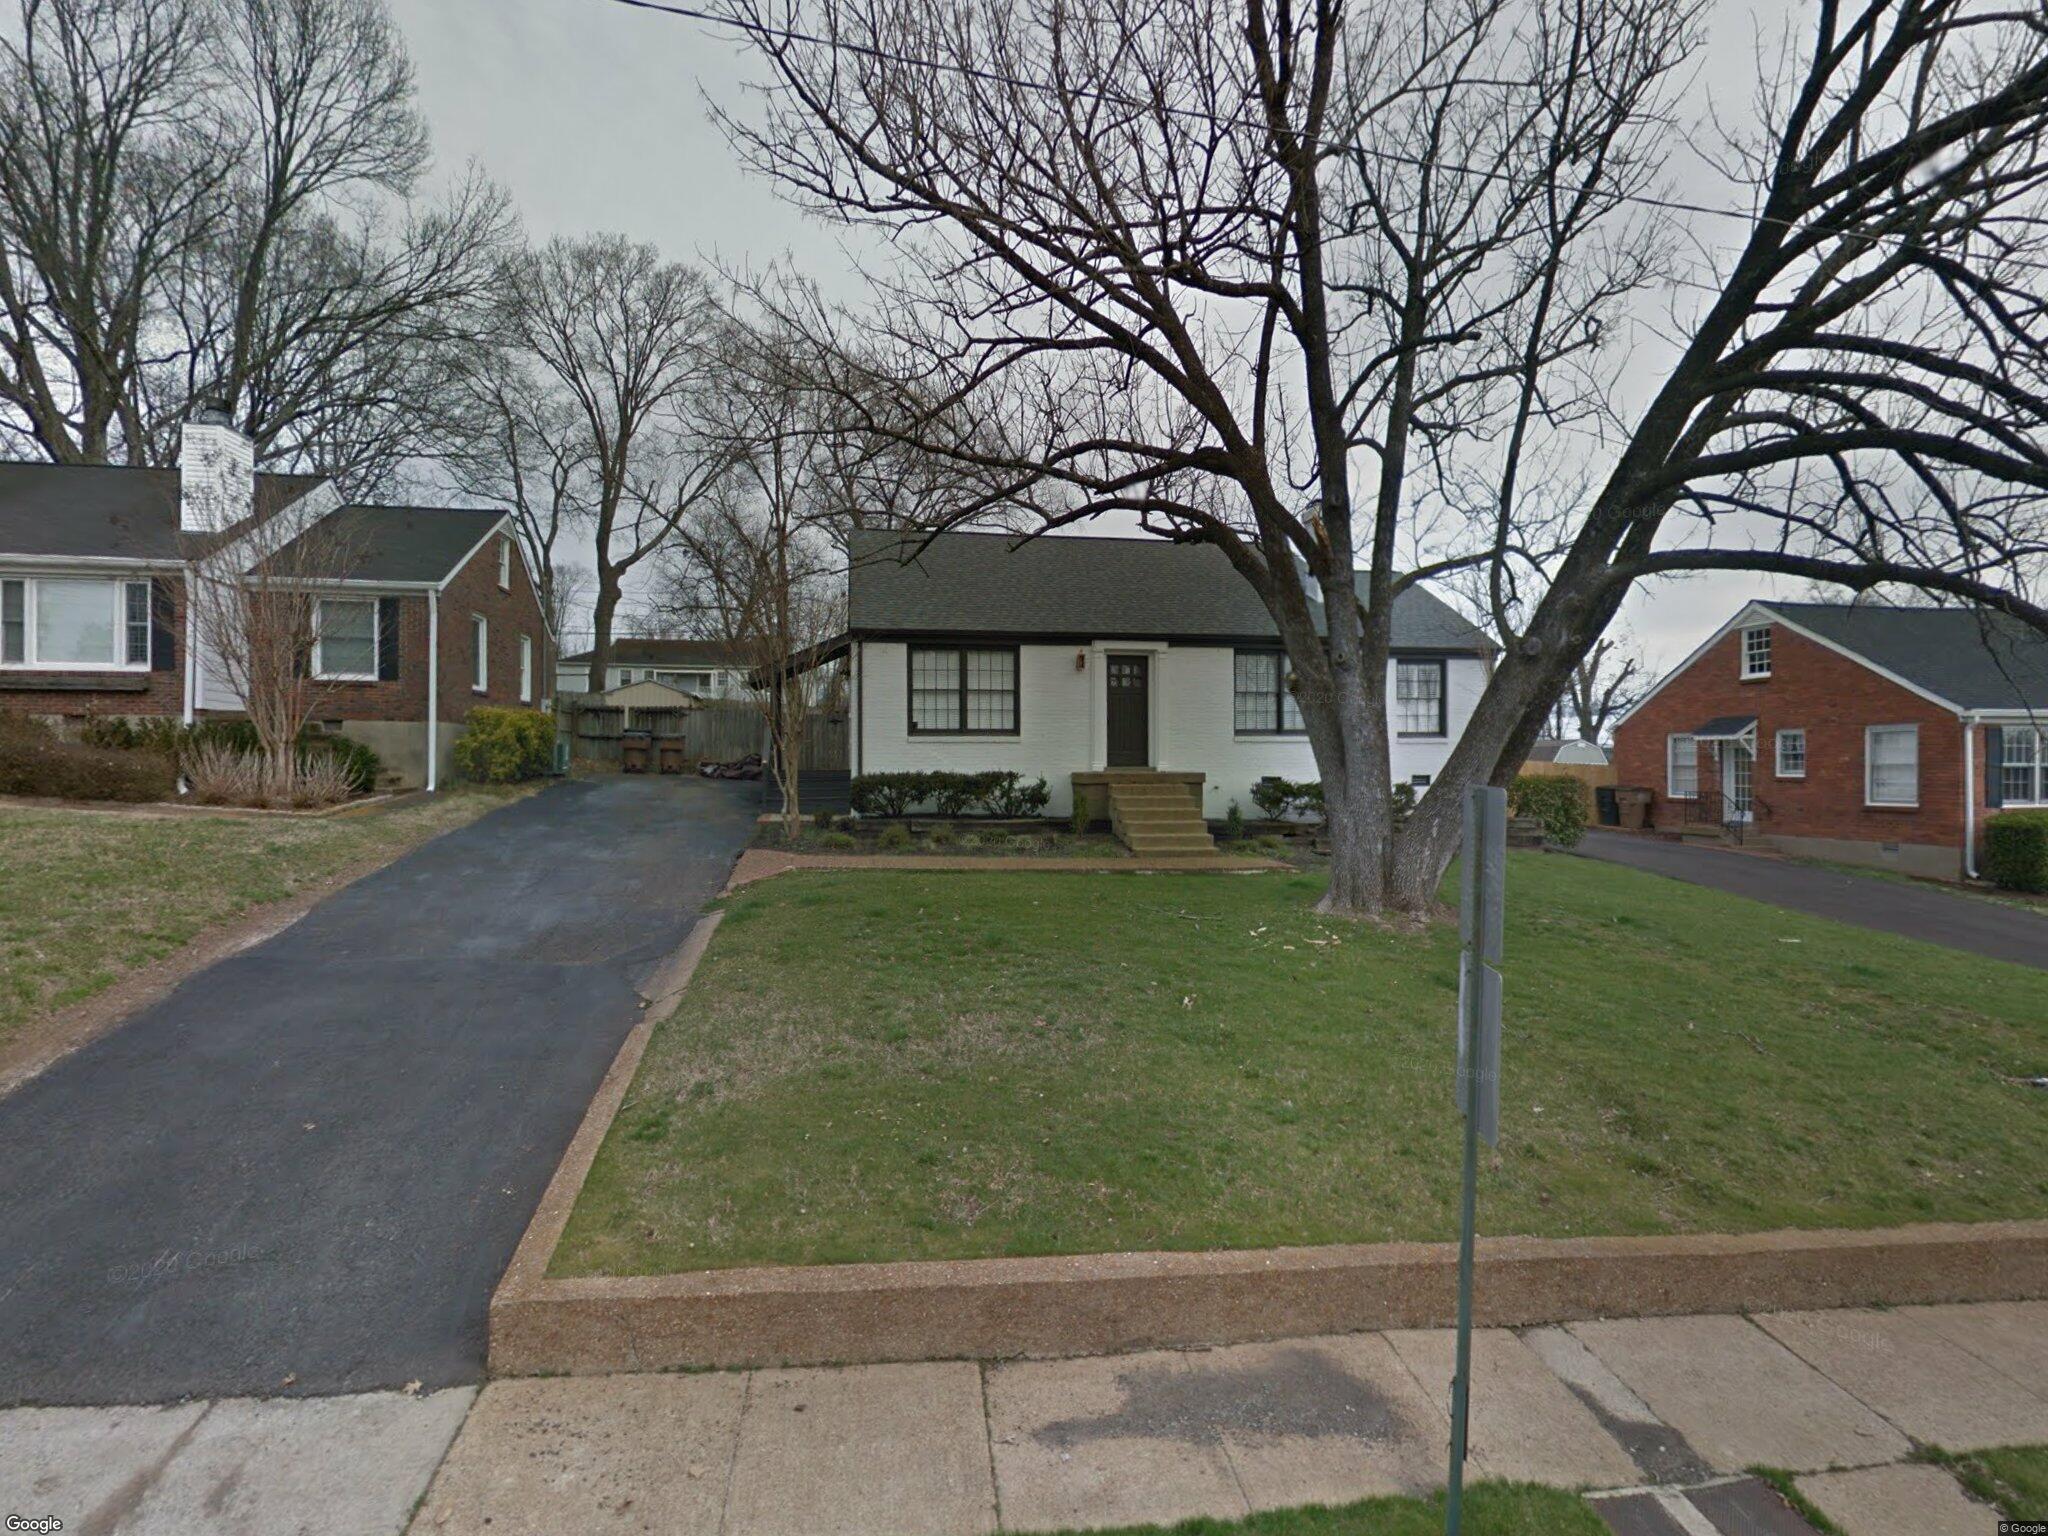 5602 Kendall Dr, Nashville, TN 37209 - Foreclosure   Trulia